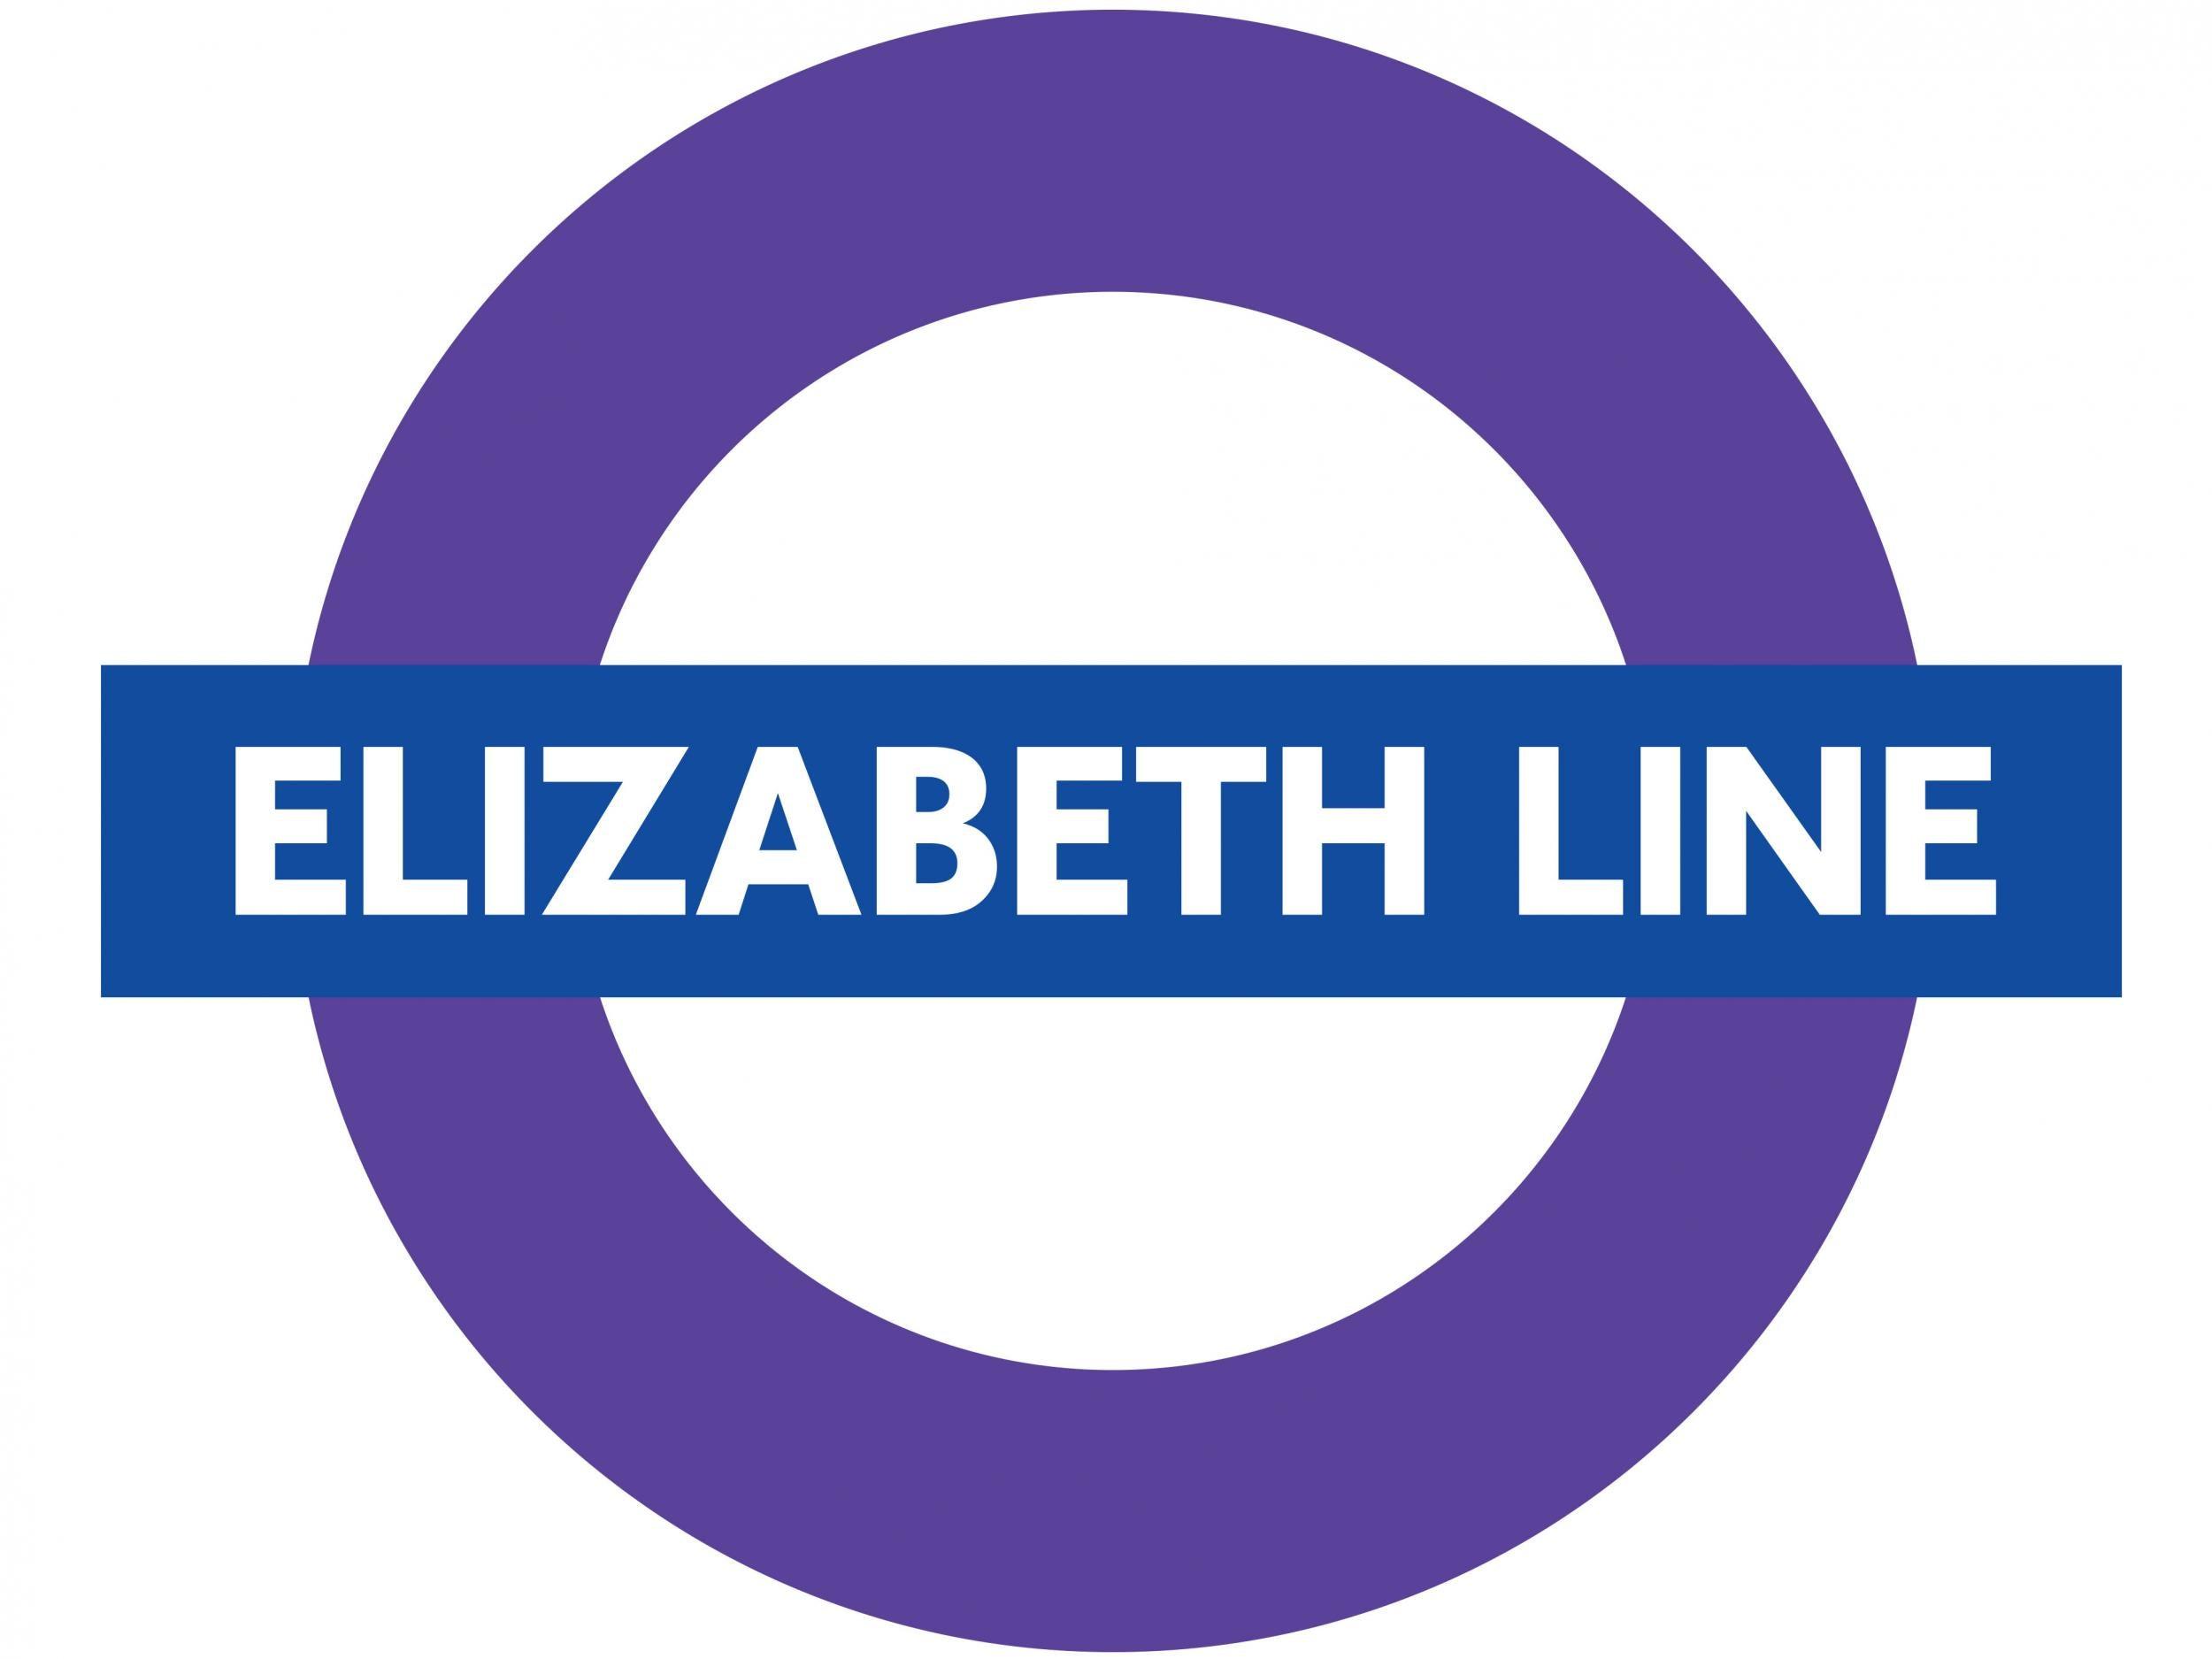 dating site logo design